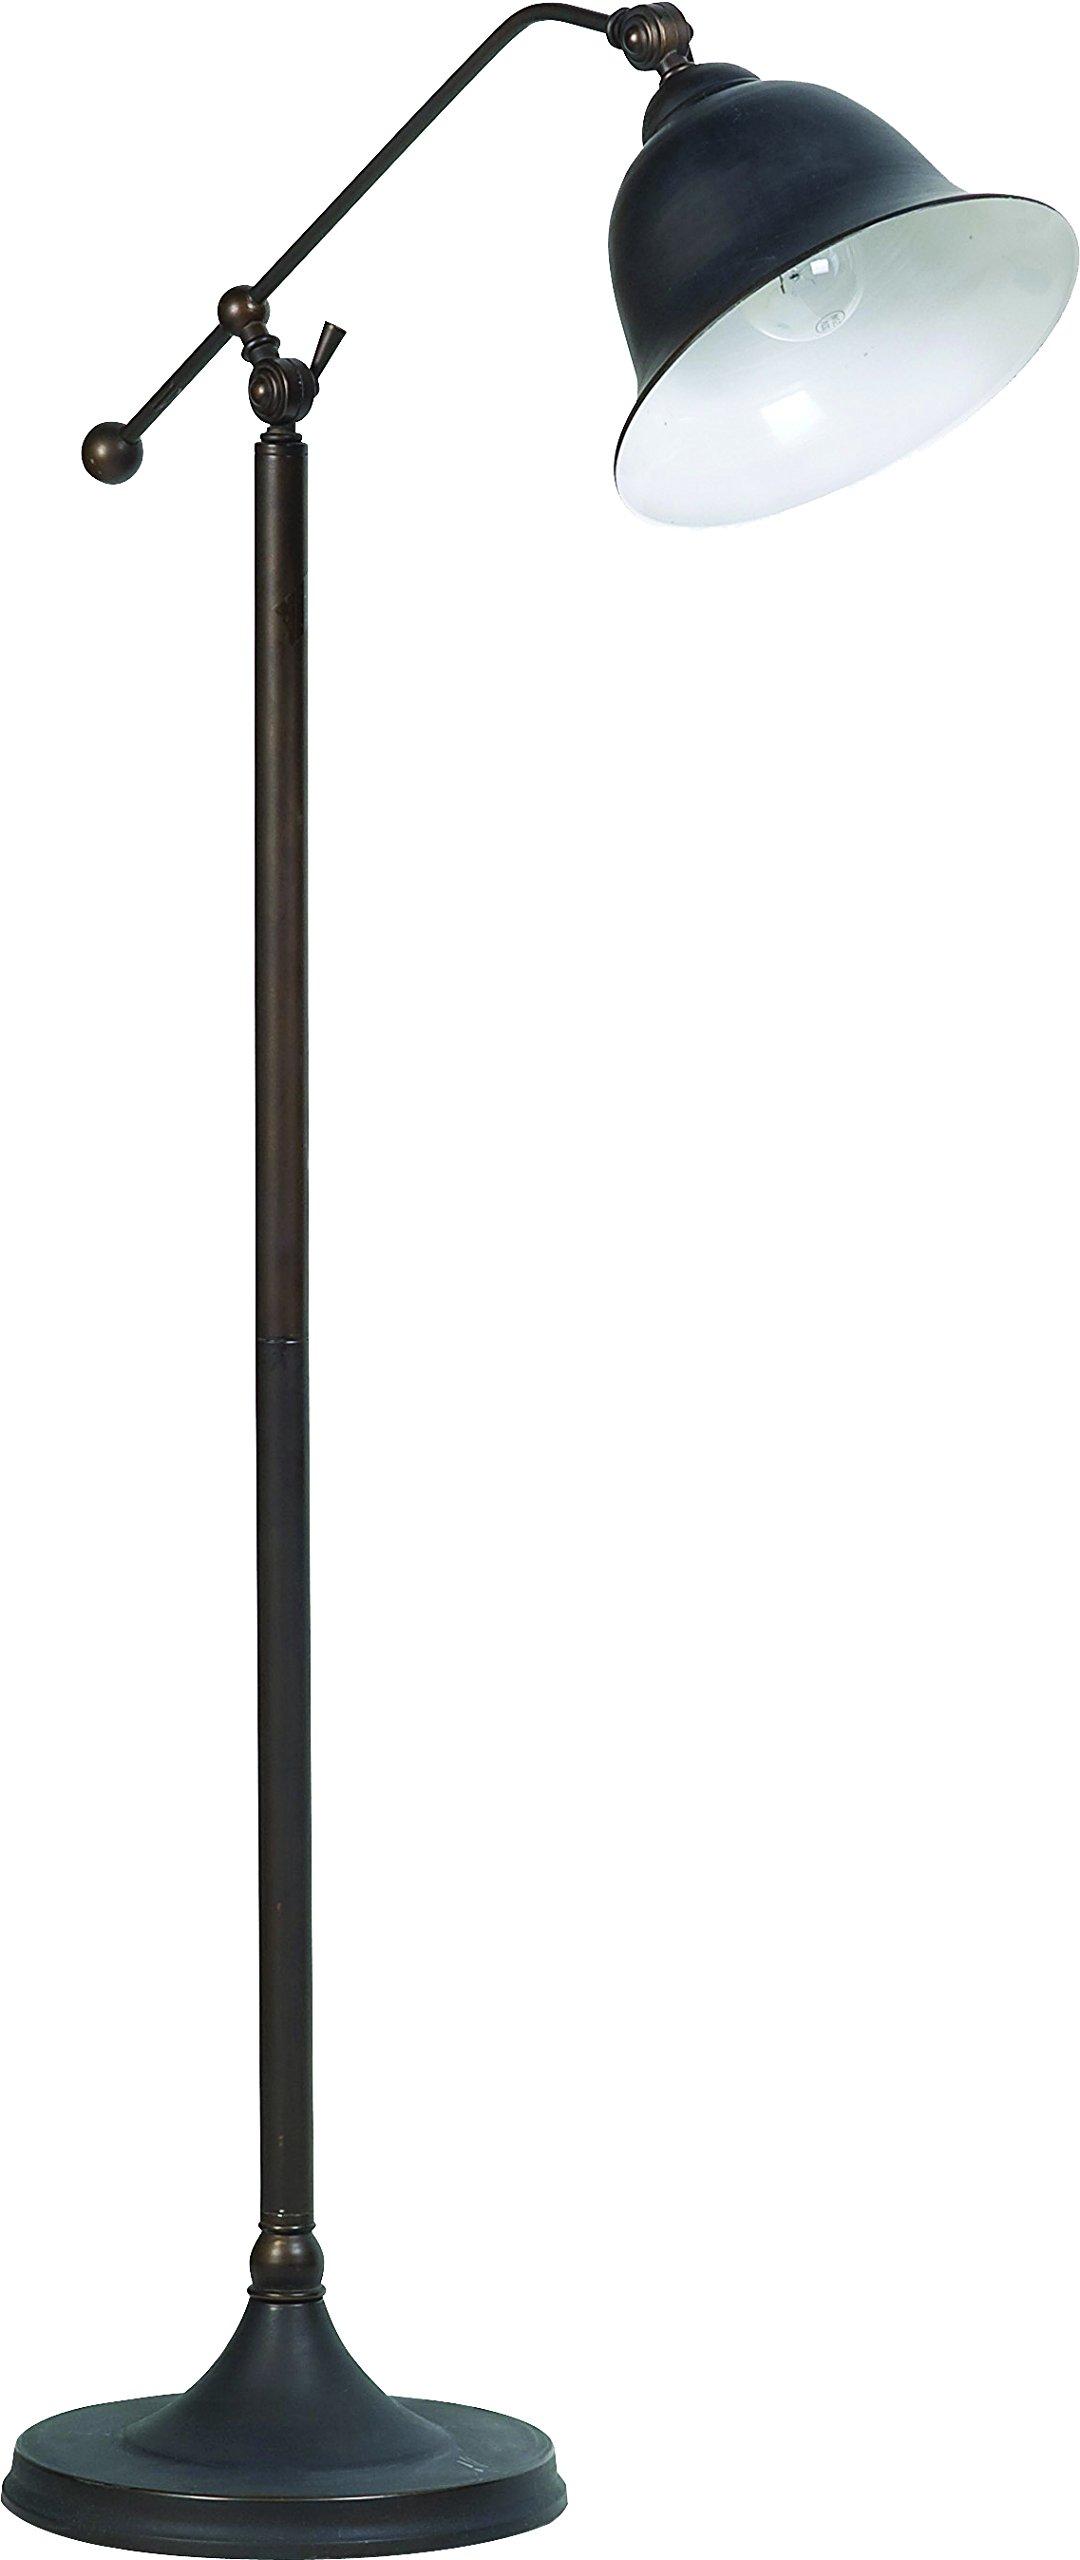 Coaster Home Furnishings 901231 Floor Lamp, Dark Bronze Metal Finish